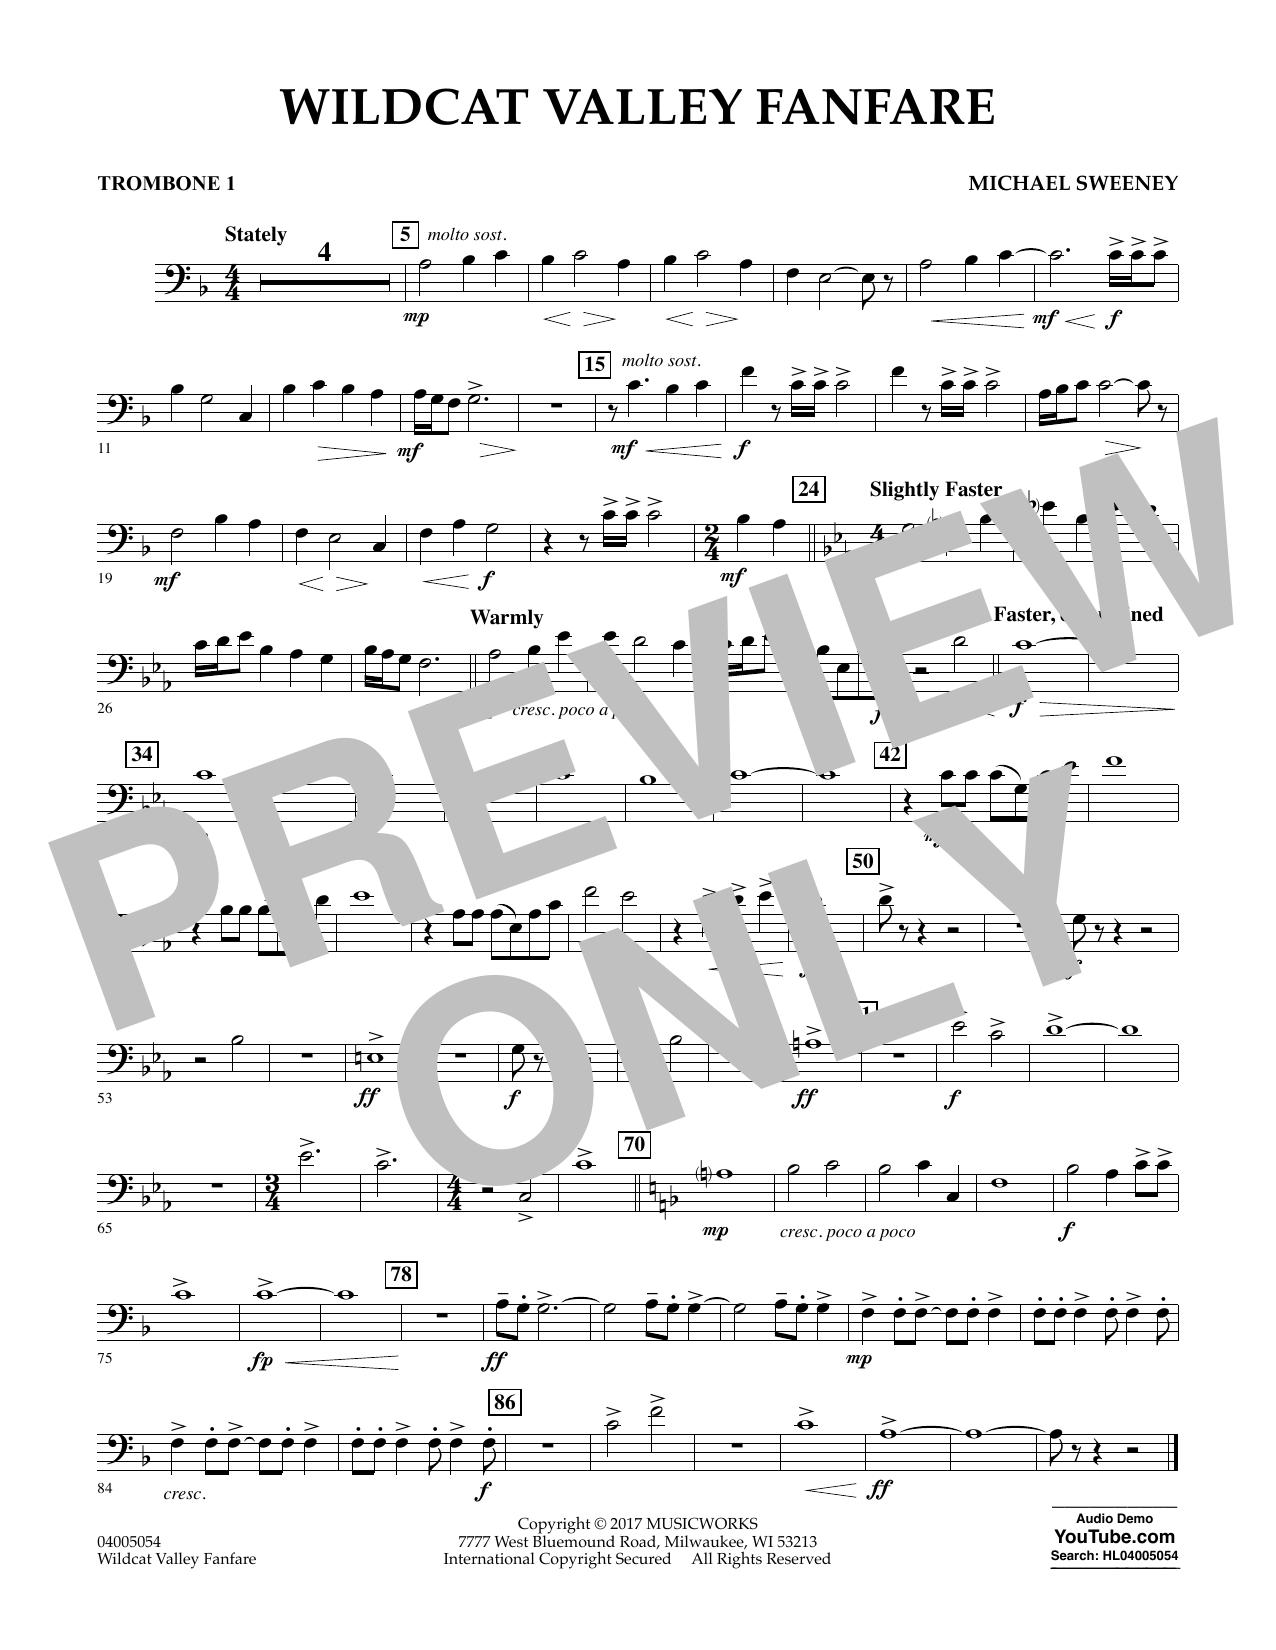 Wildcat Valley Fanfare - Trombone 1 Sheet Music